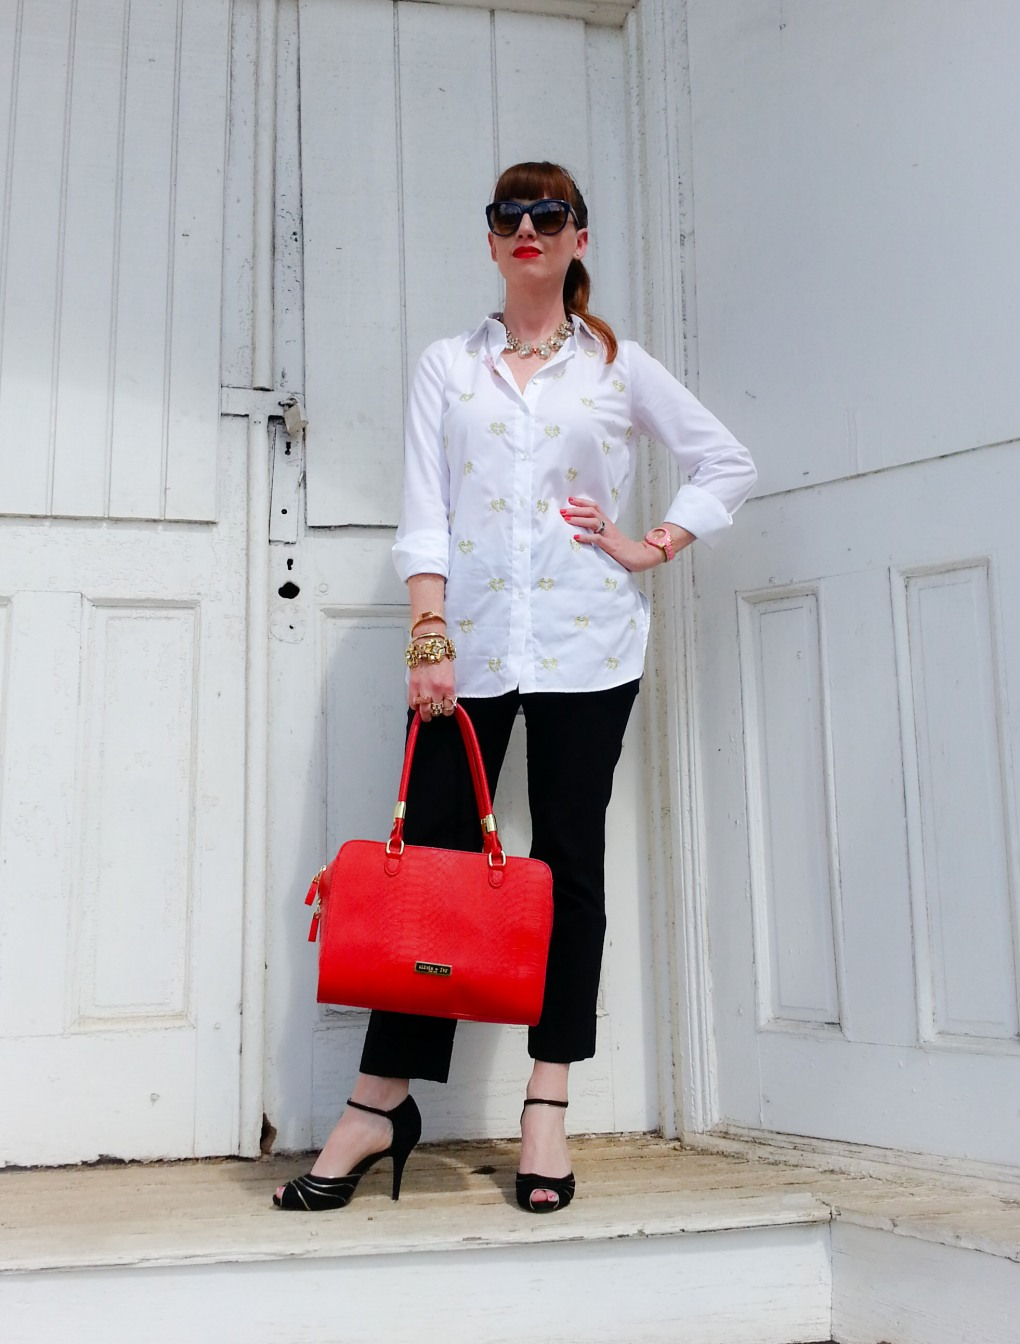 Shirt: JCREW Pants: Limited Bag: Olivia+Joy Shoes: Jessica Simpson Sunnies: Franco Sarto Lips: Stila Beso